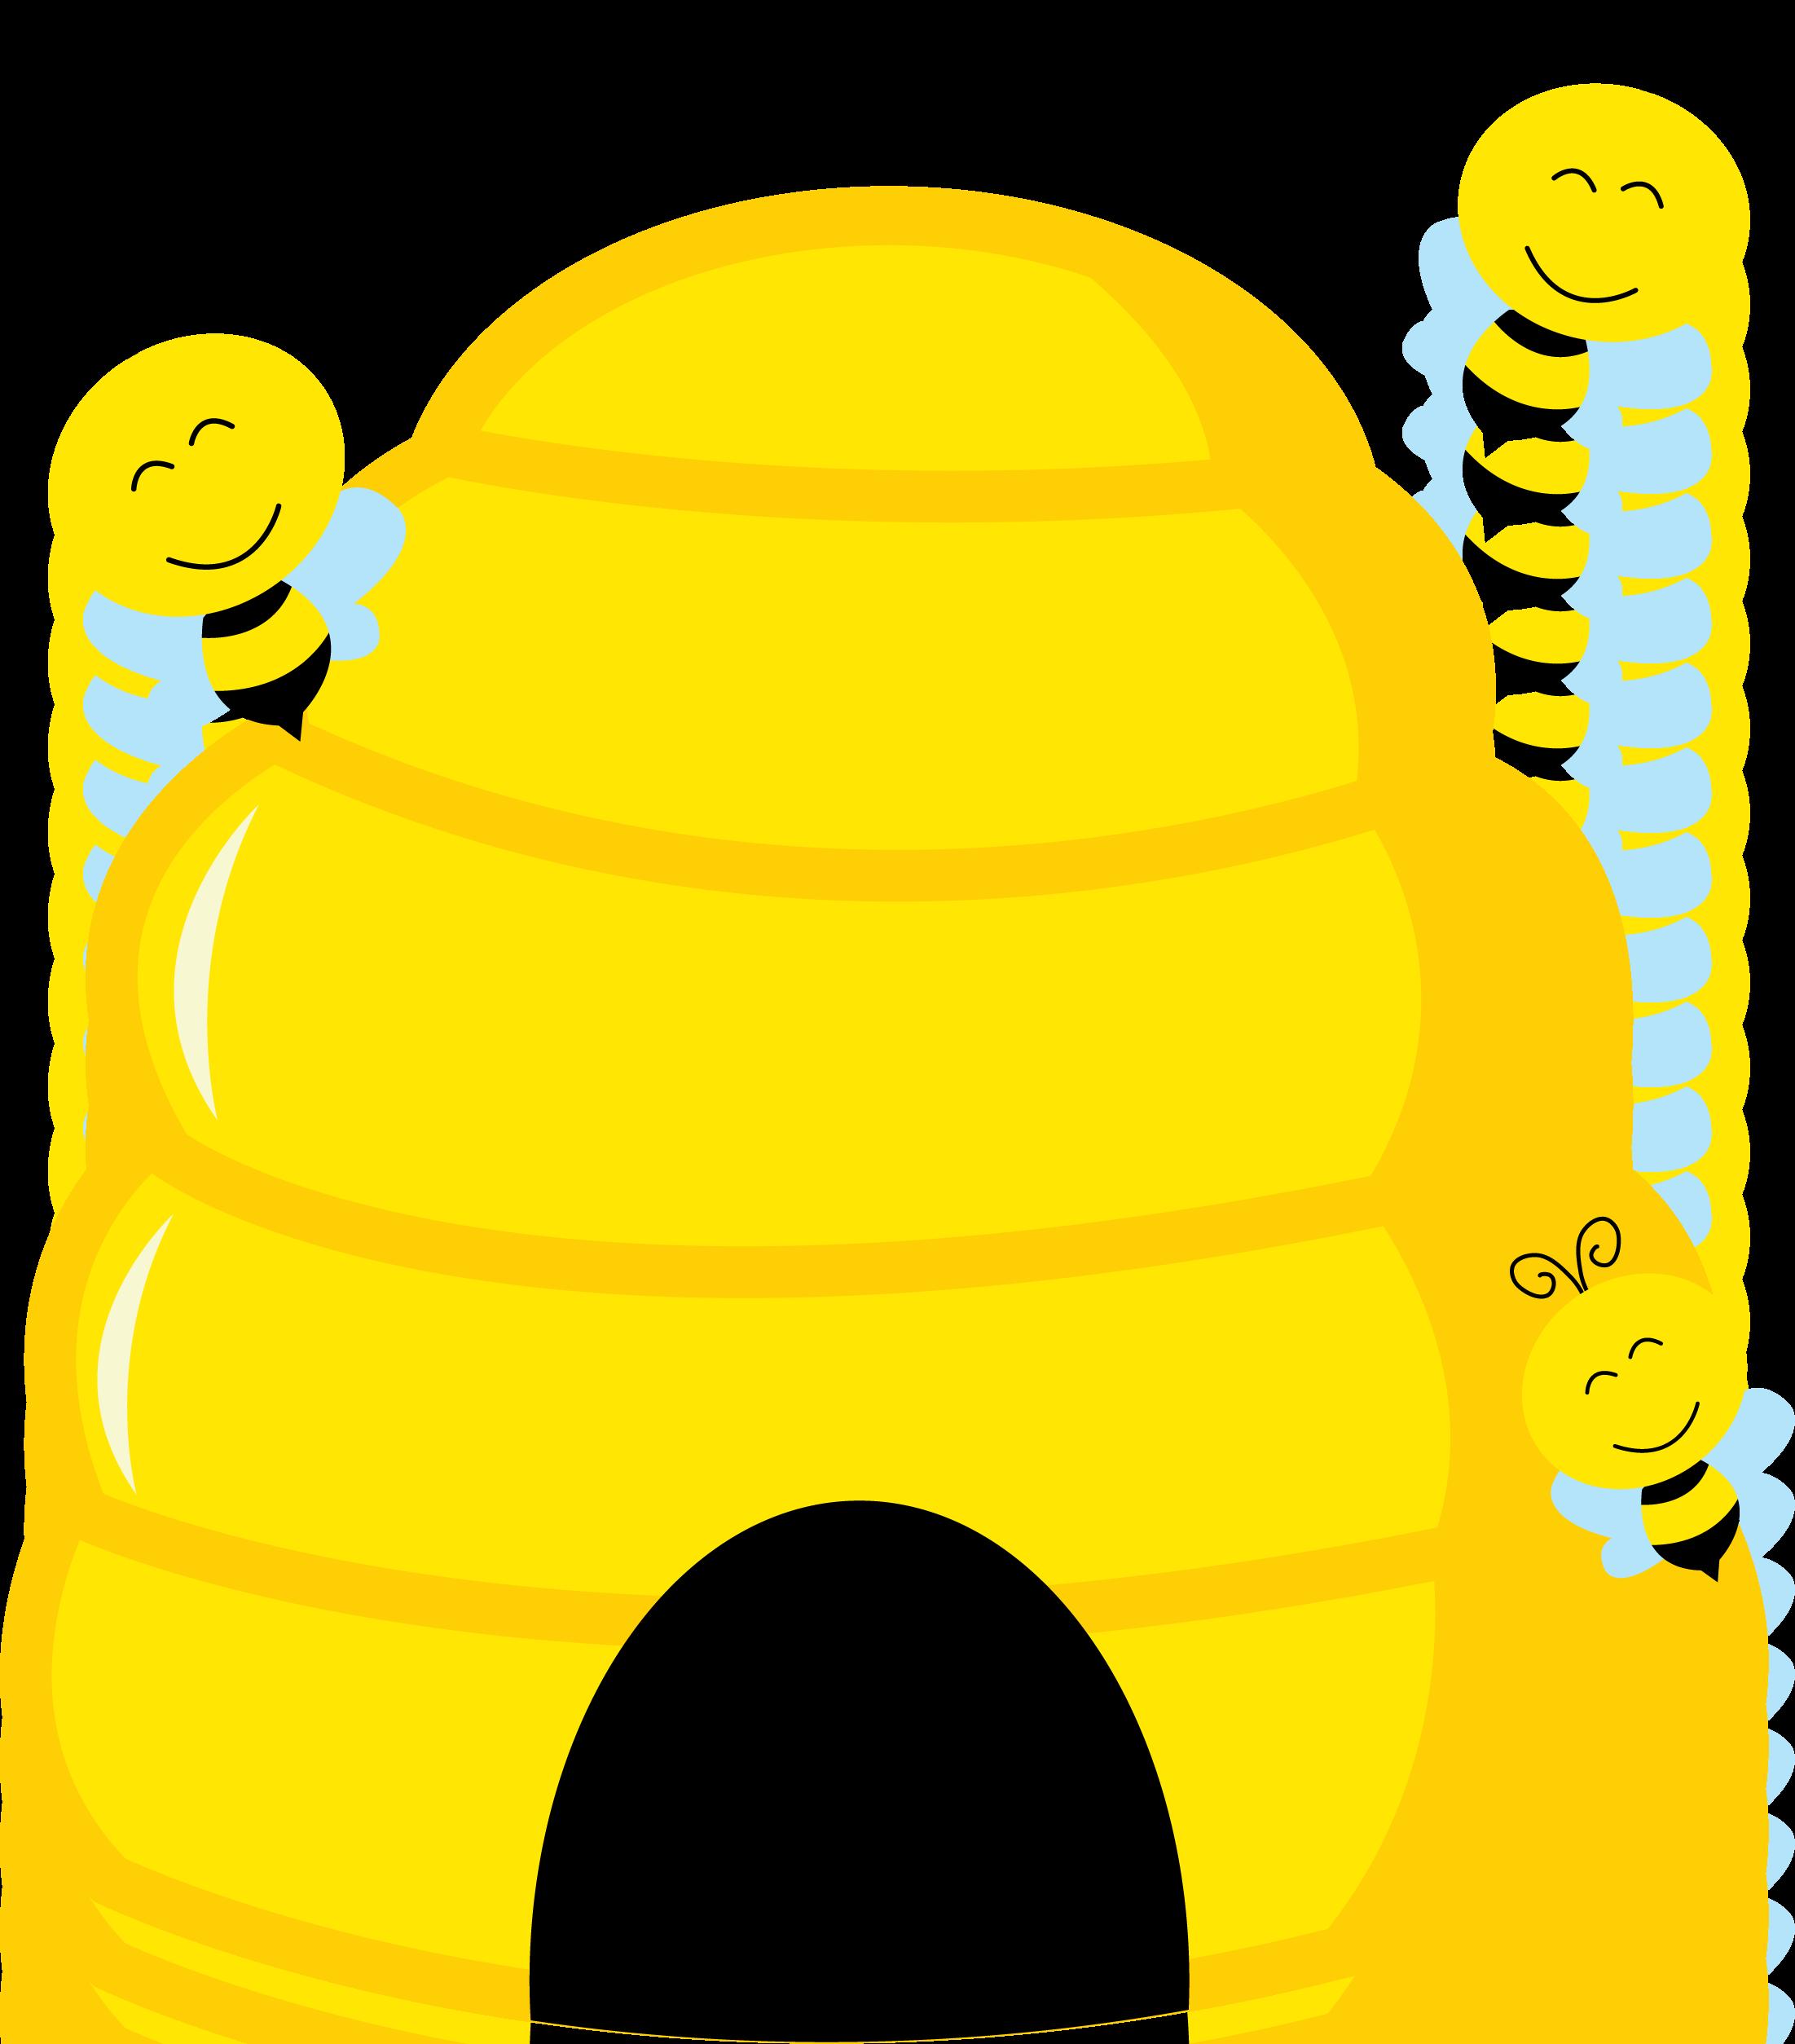 Circle clipart bee. Imagens da abelhinha bees